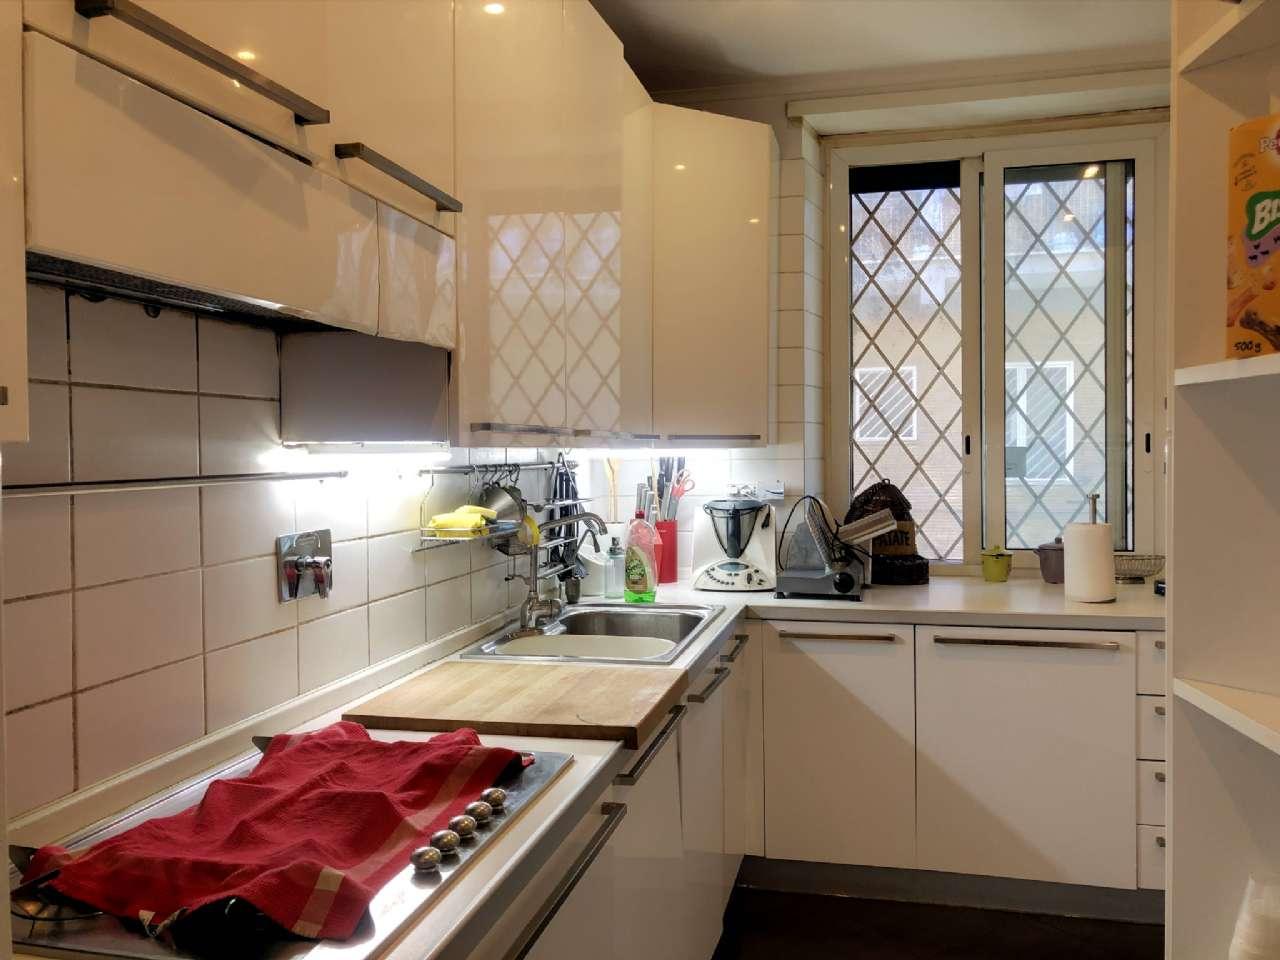 Appartamento, Via dei Monti Parioli, Roma, foto 6